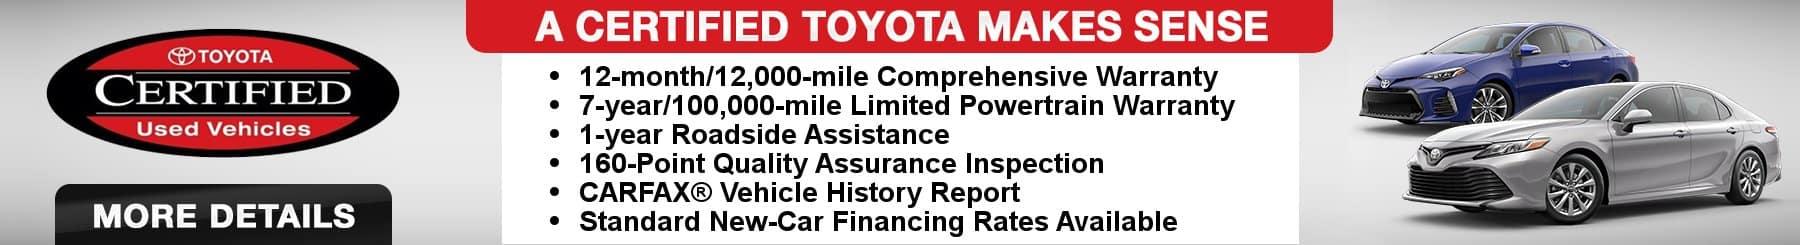 Toyota-Certified-Program